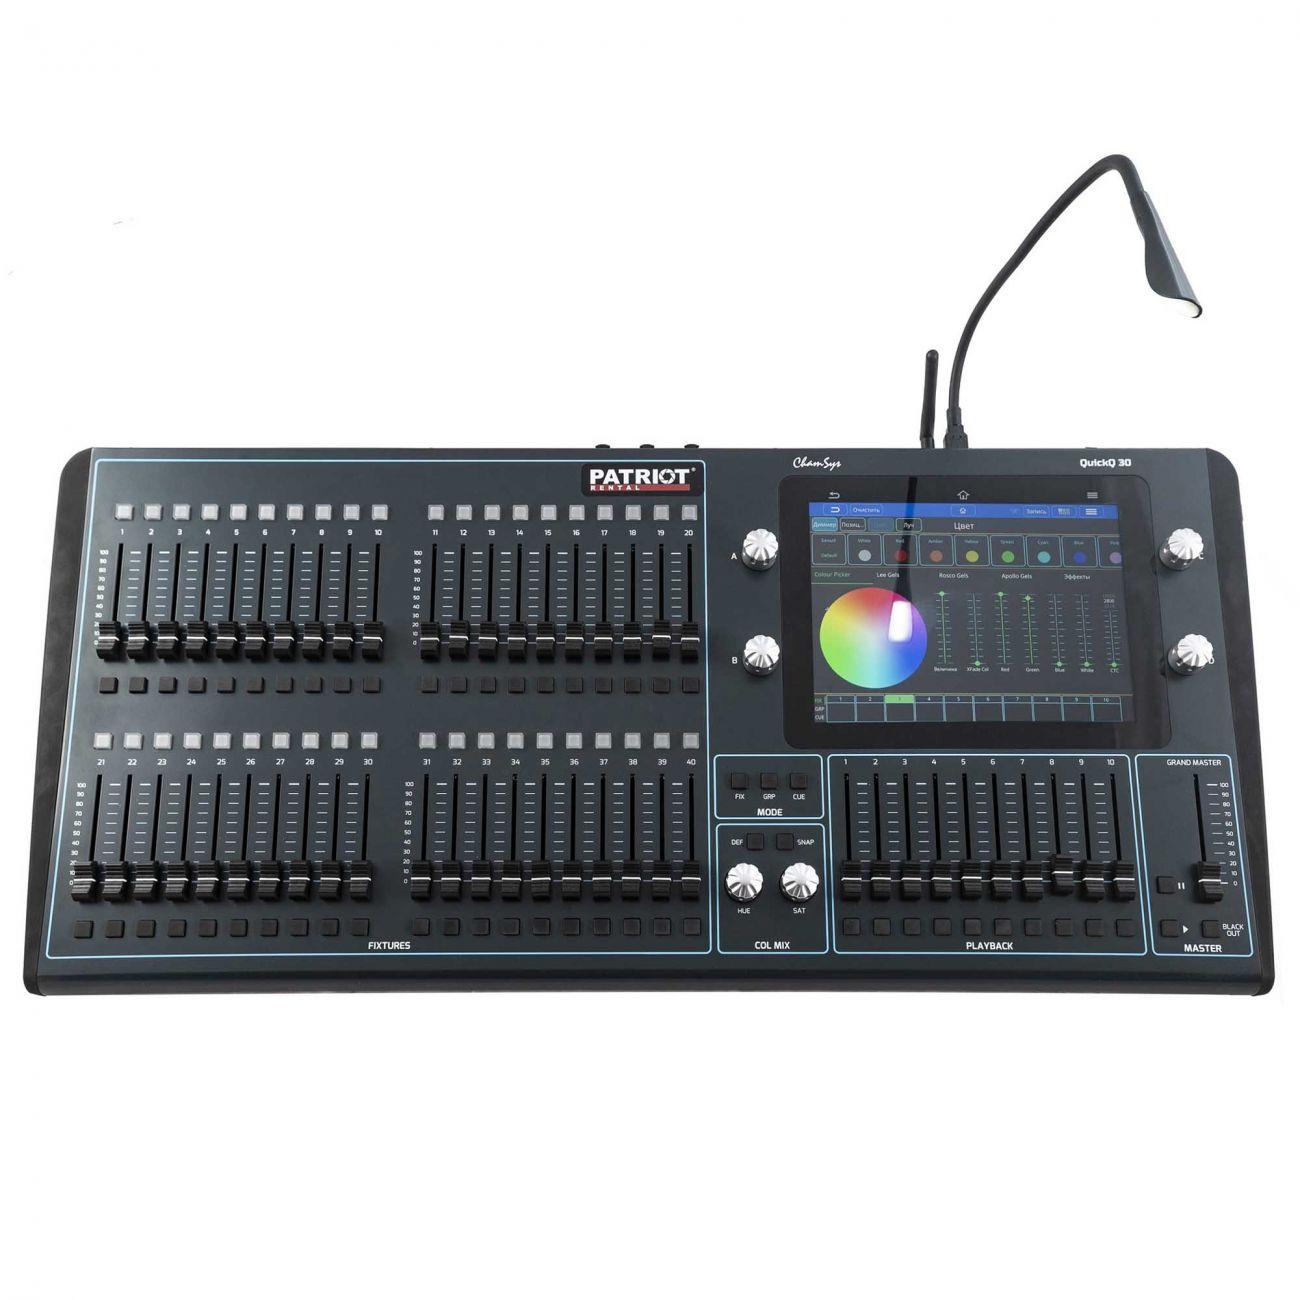 ARRI SkyPanel Control Panel Chamsys Quick Q30 2048 channel